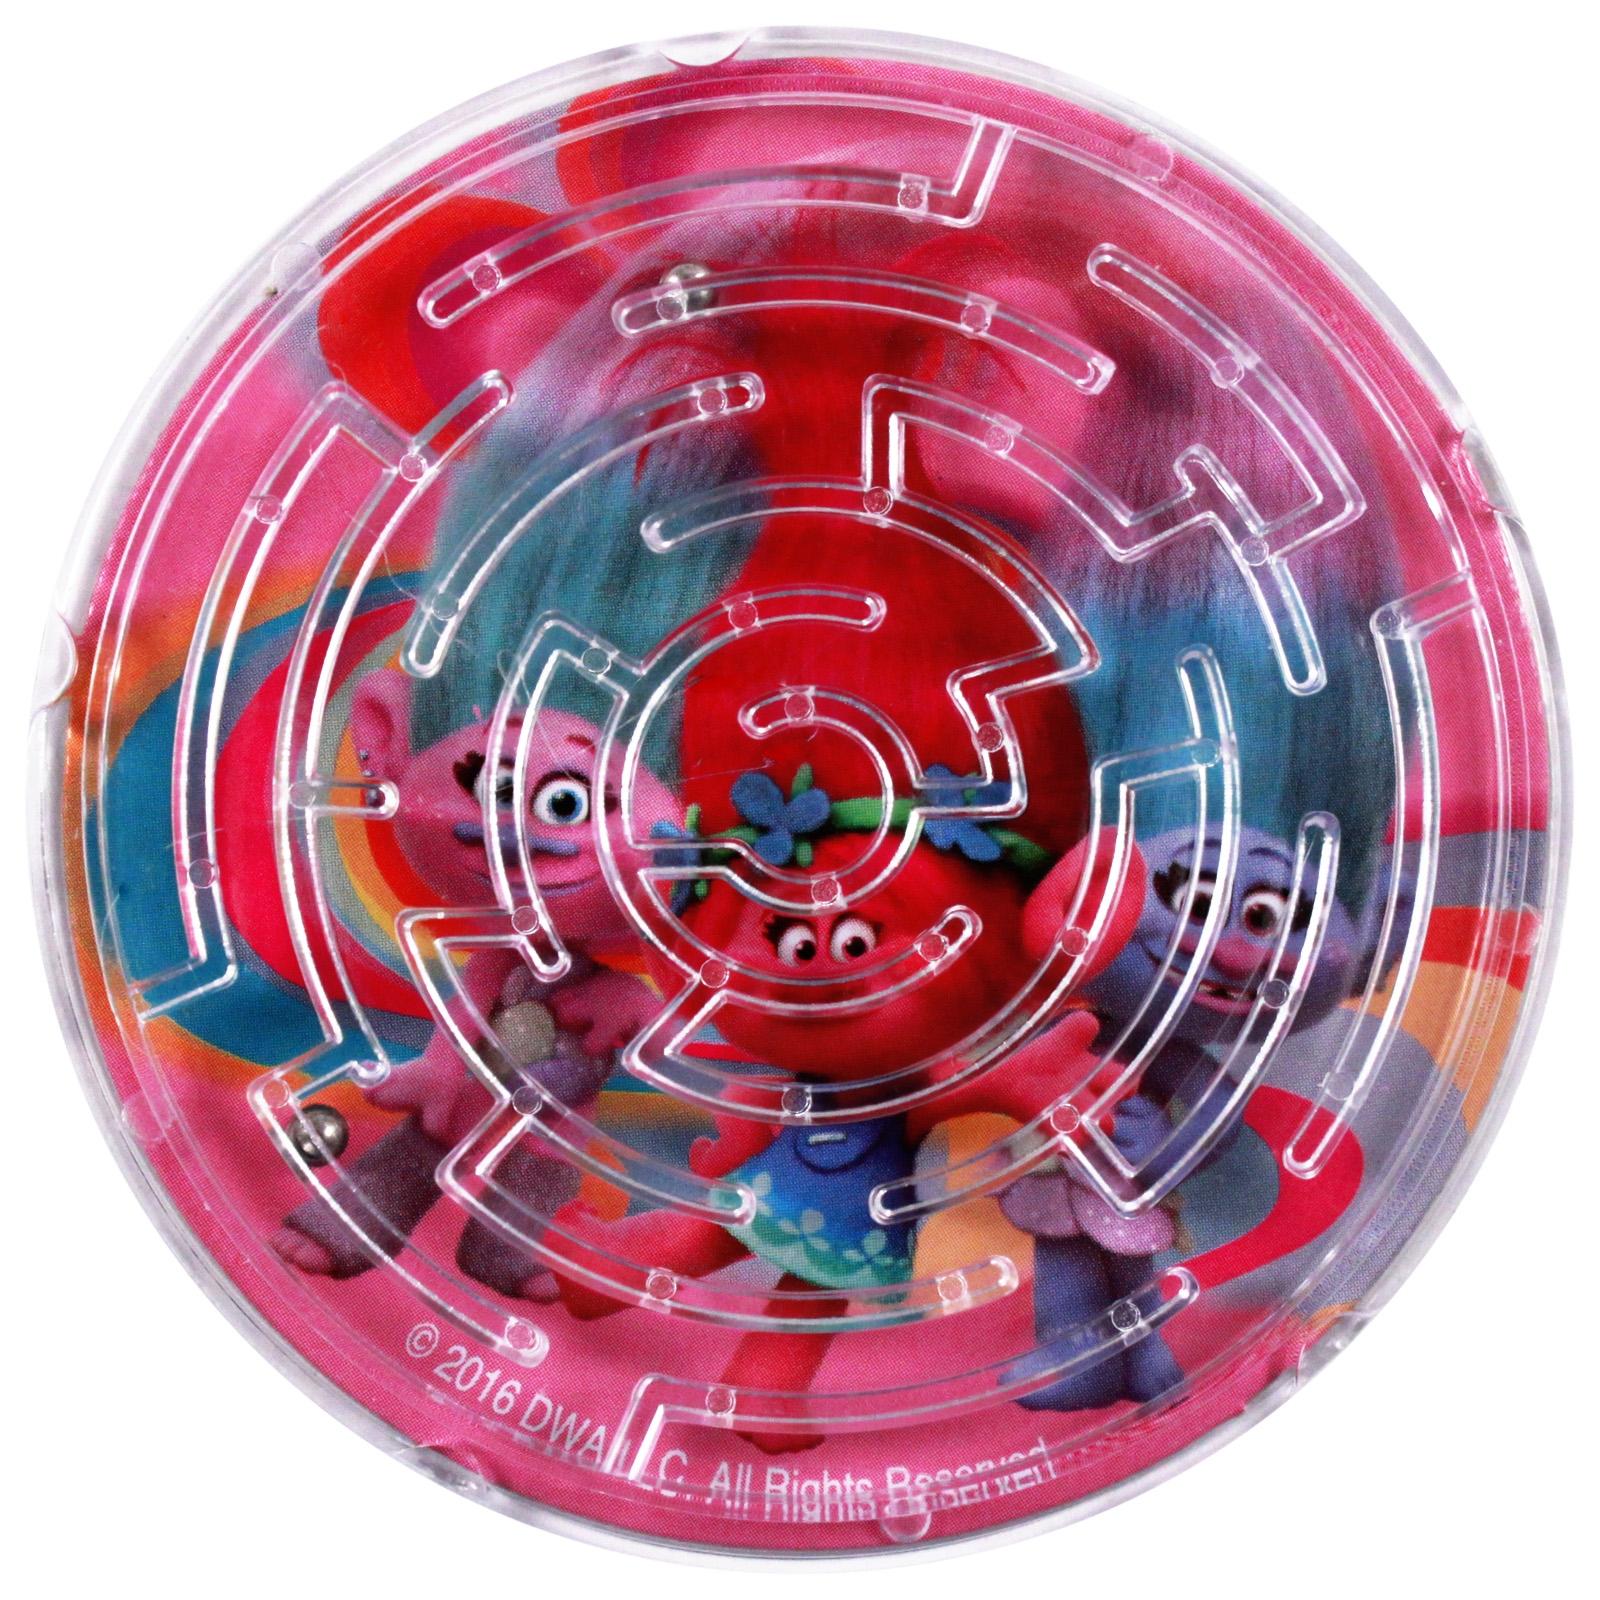 Dreamworks Trolls Lip Balm and Maze Puzzle Travel Accessory Gift Set